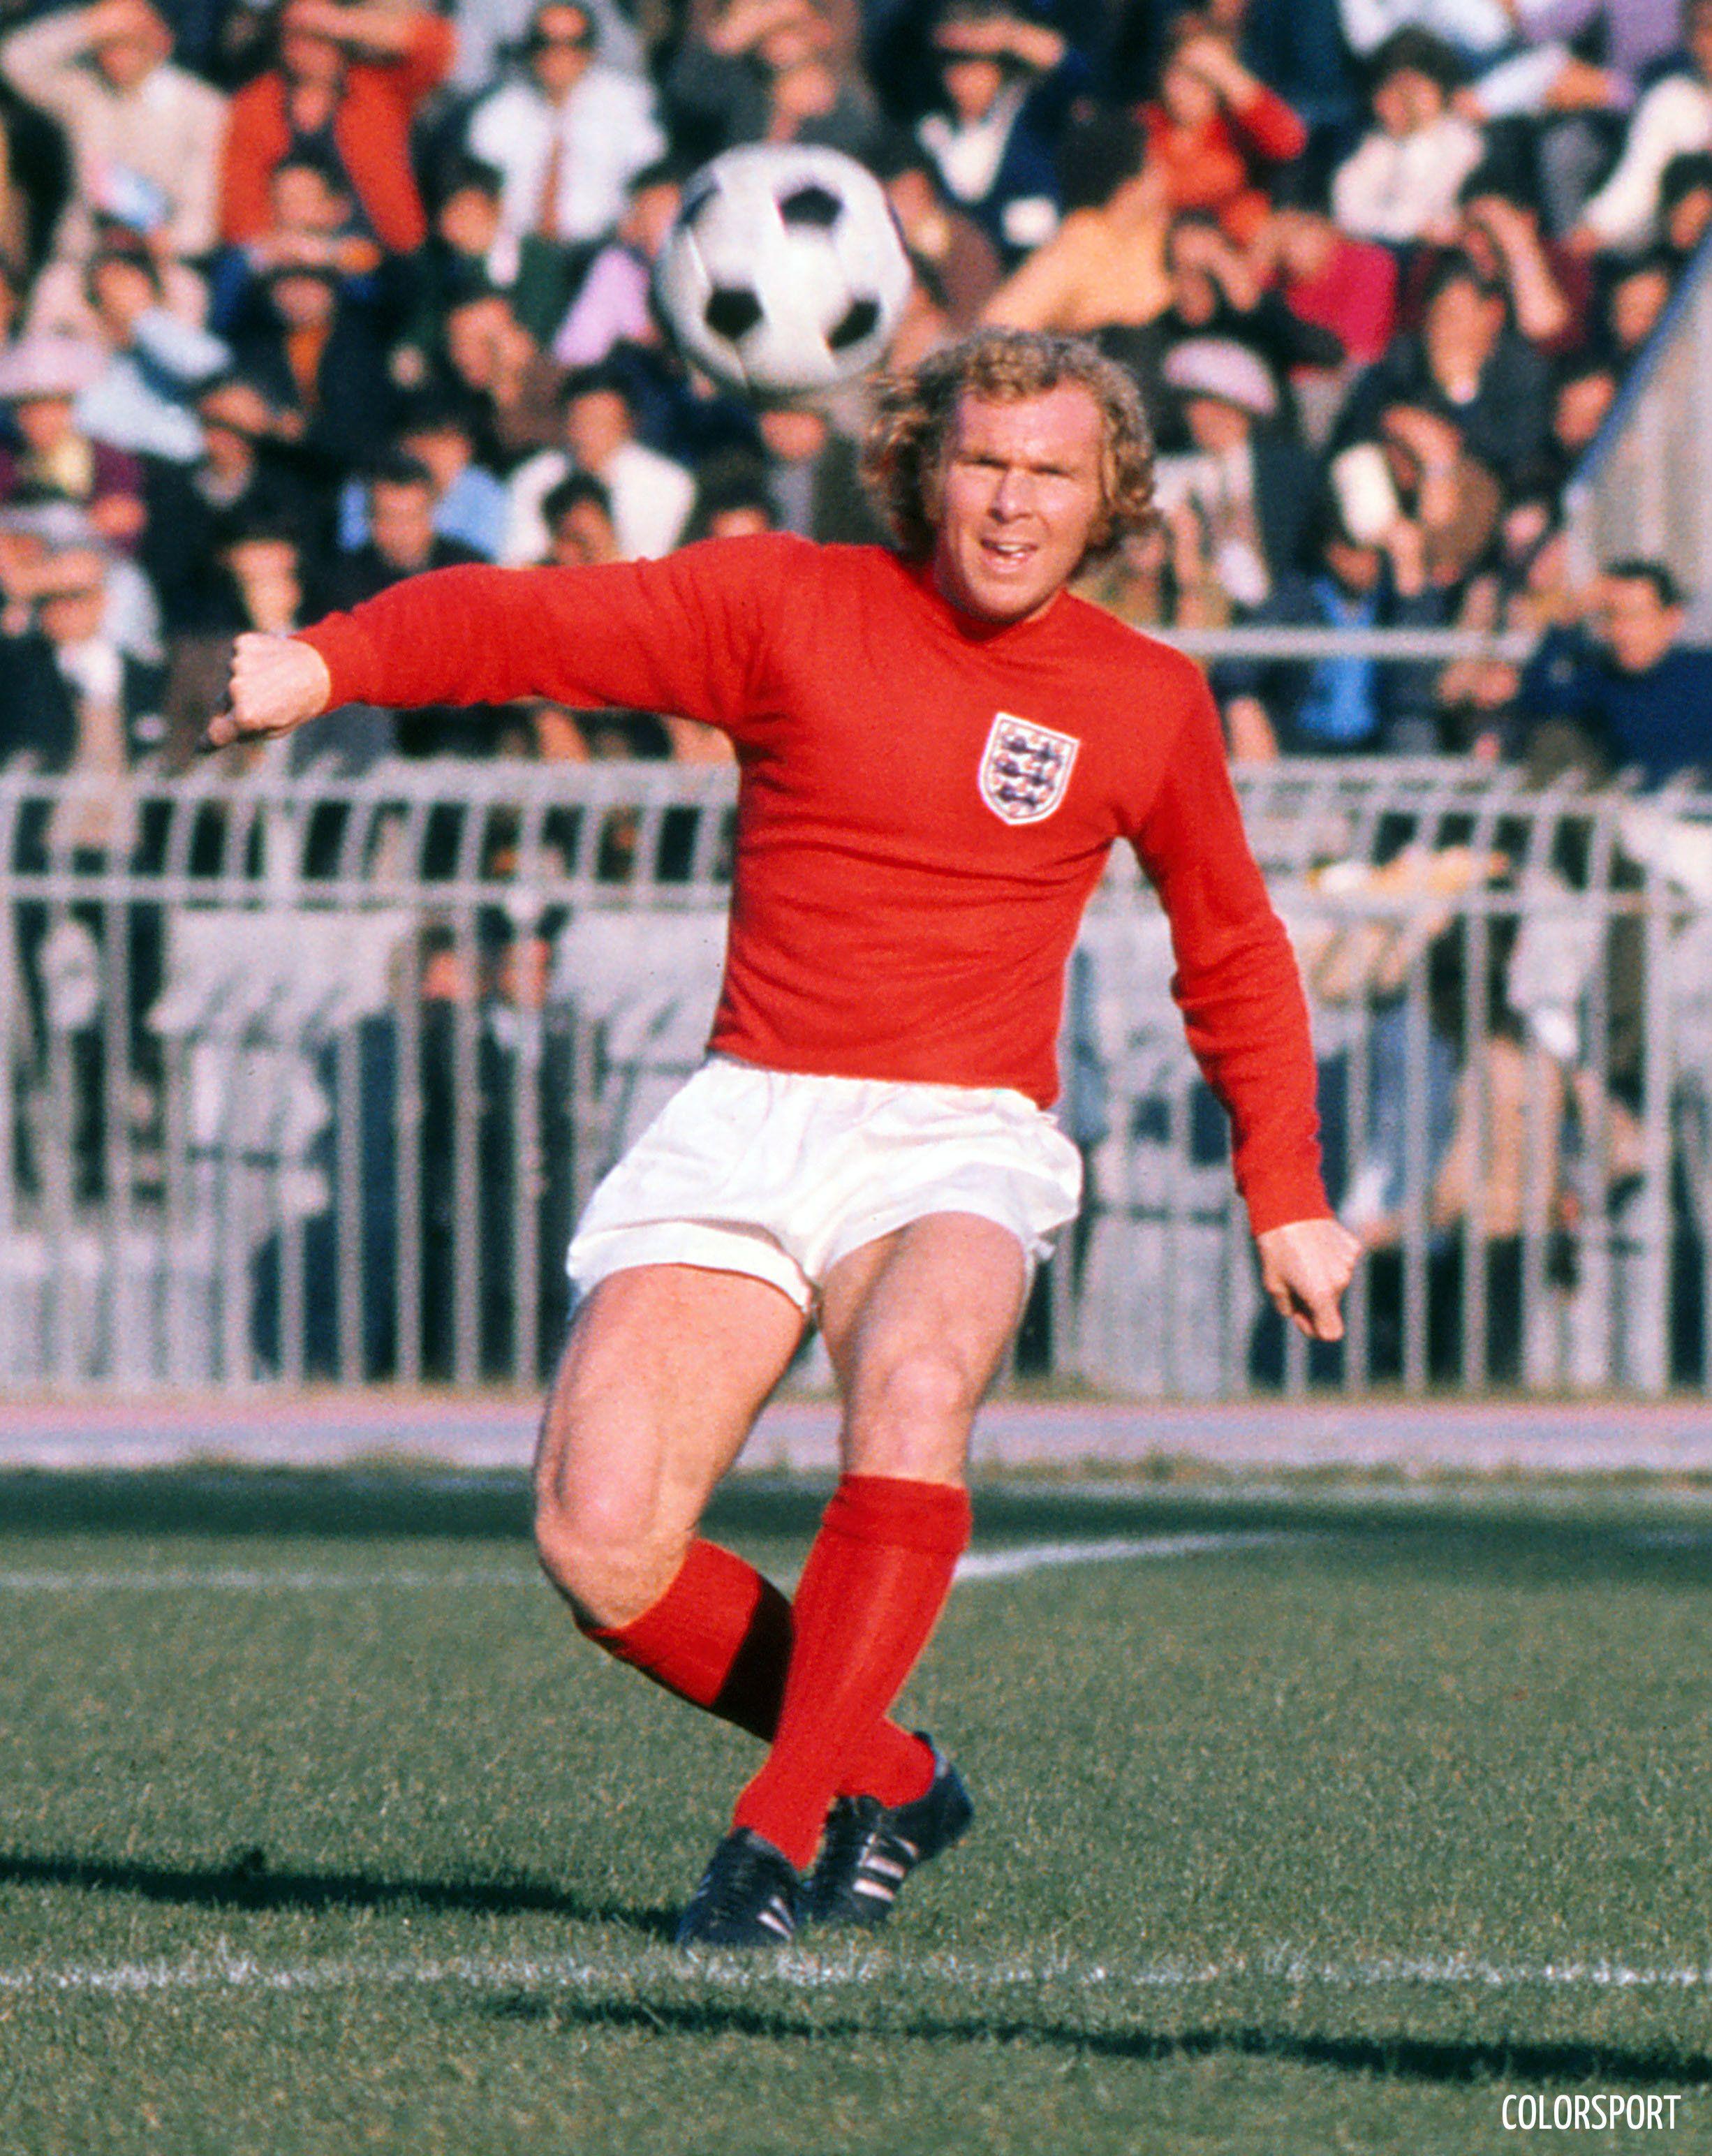 Bobby Moore England Football Team Won The World Cup In 1966 Bobby Moore England Football England Football Players